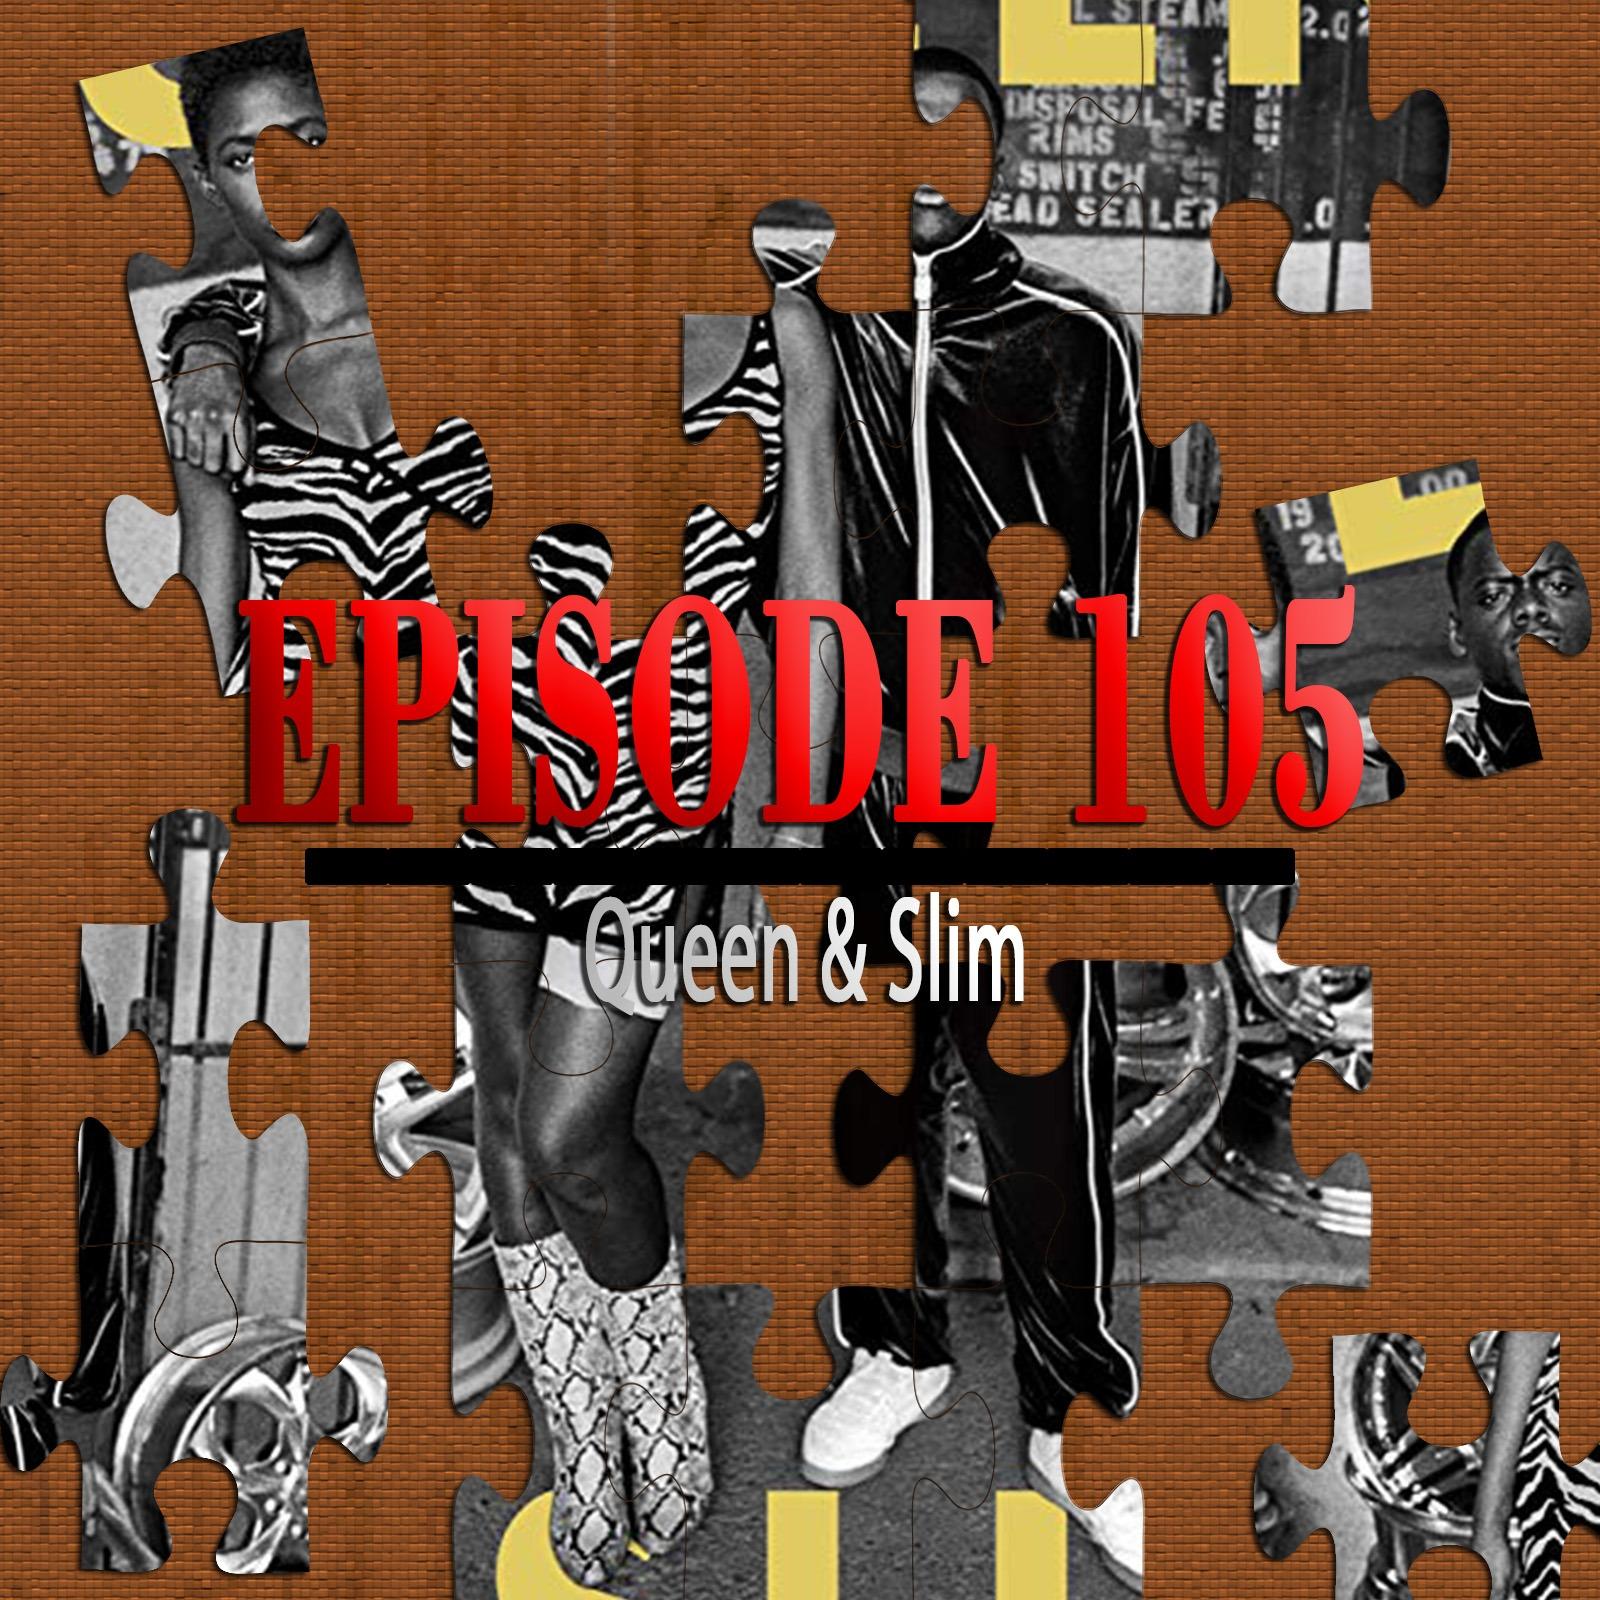 Queen & Slim (Featuring Kolby Mac)